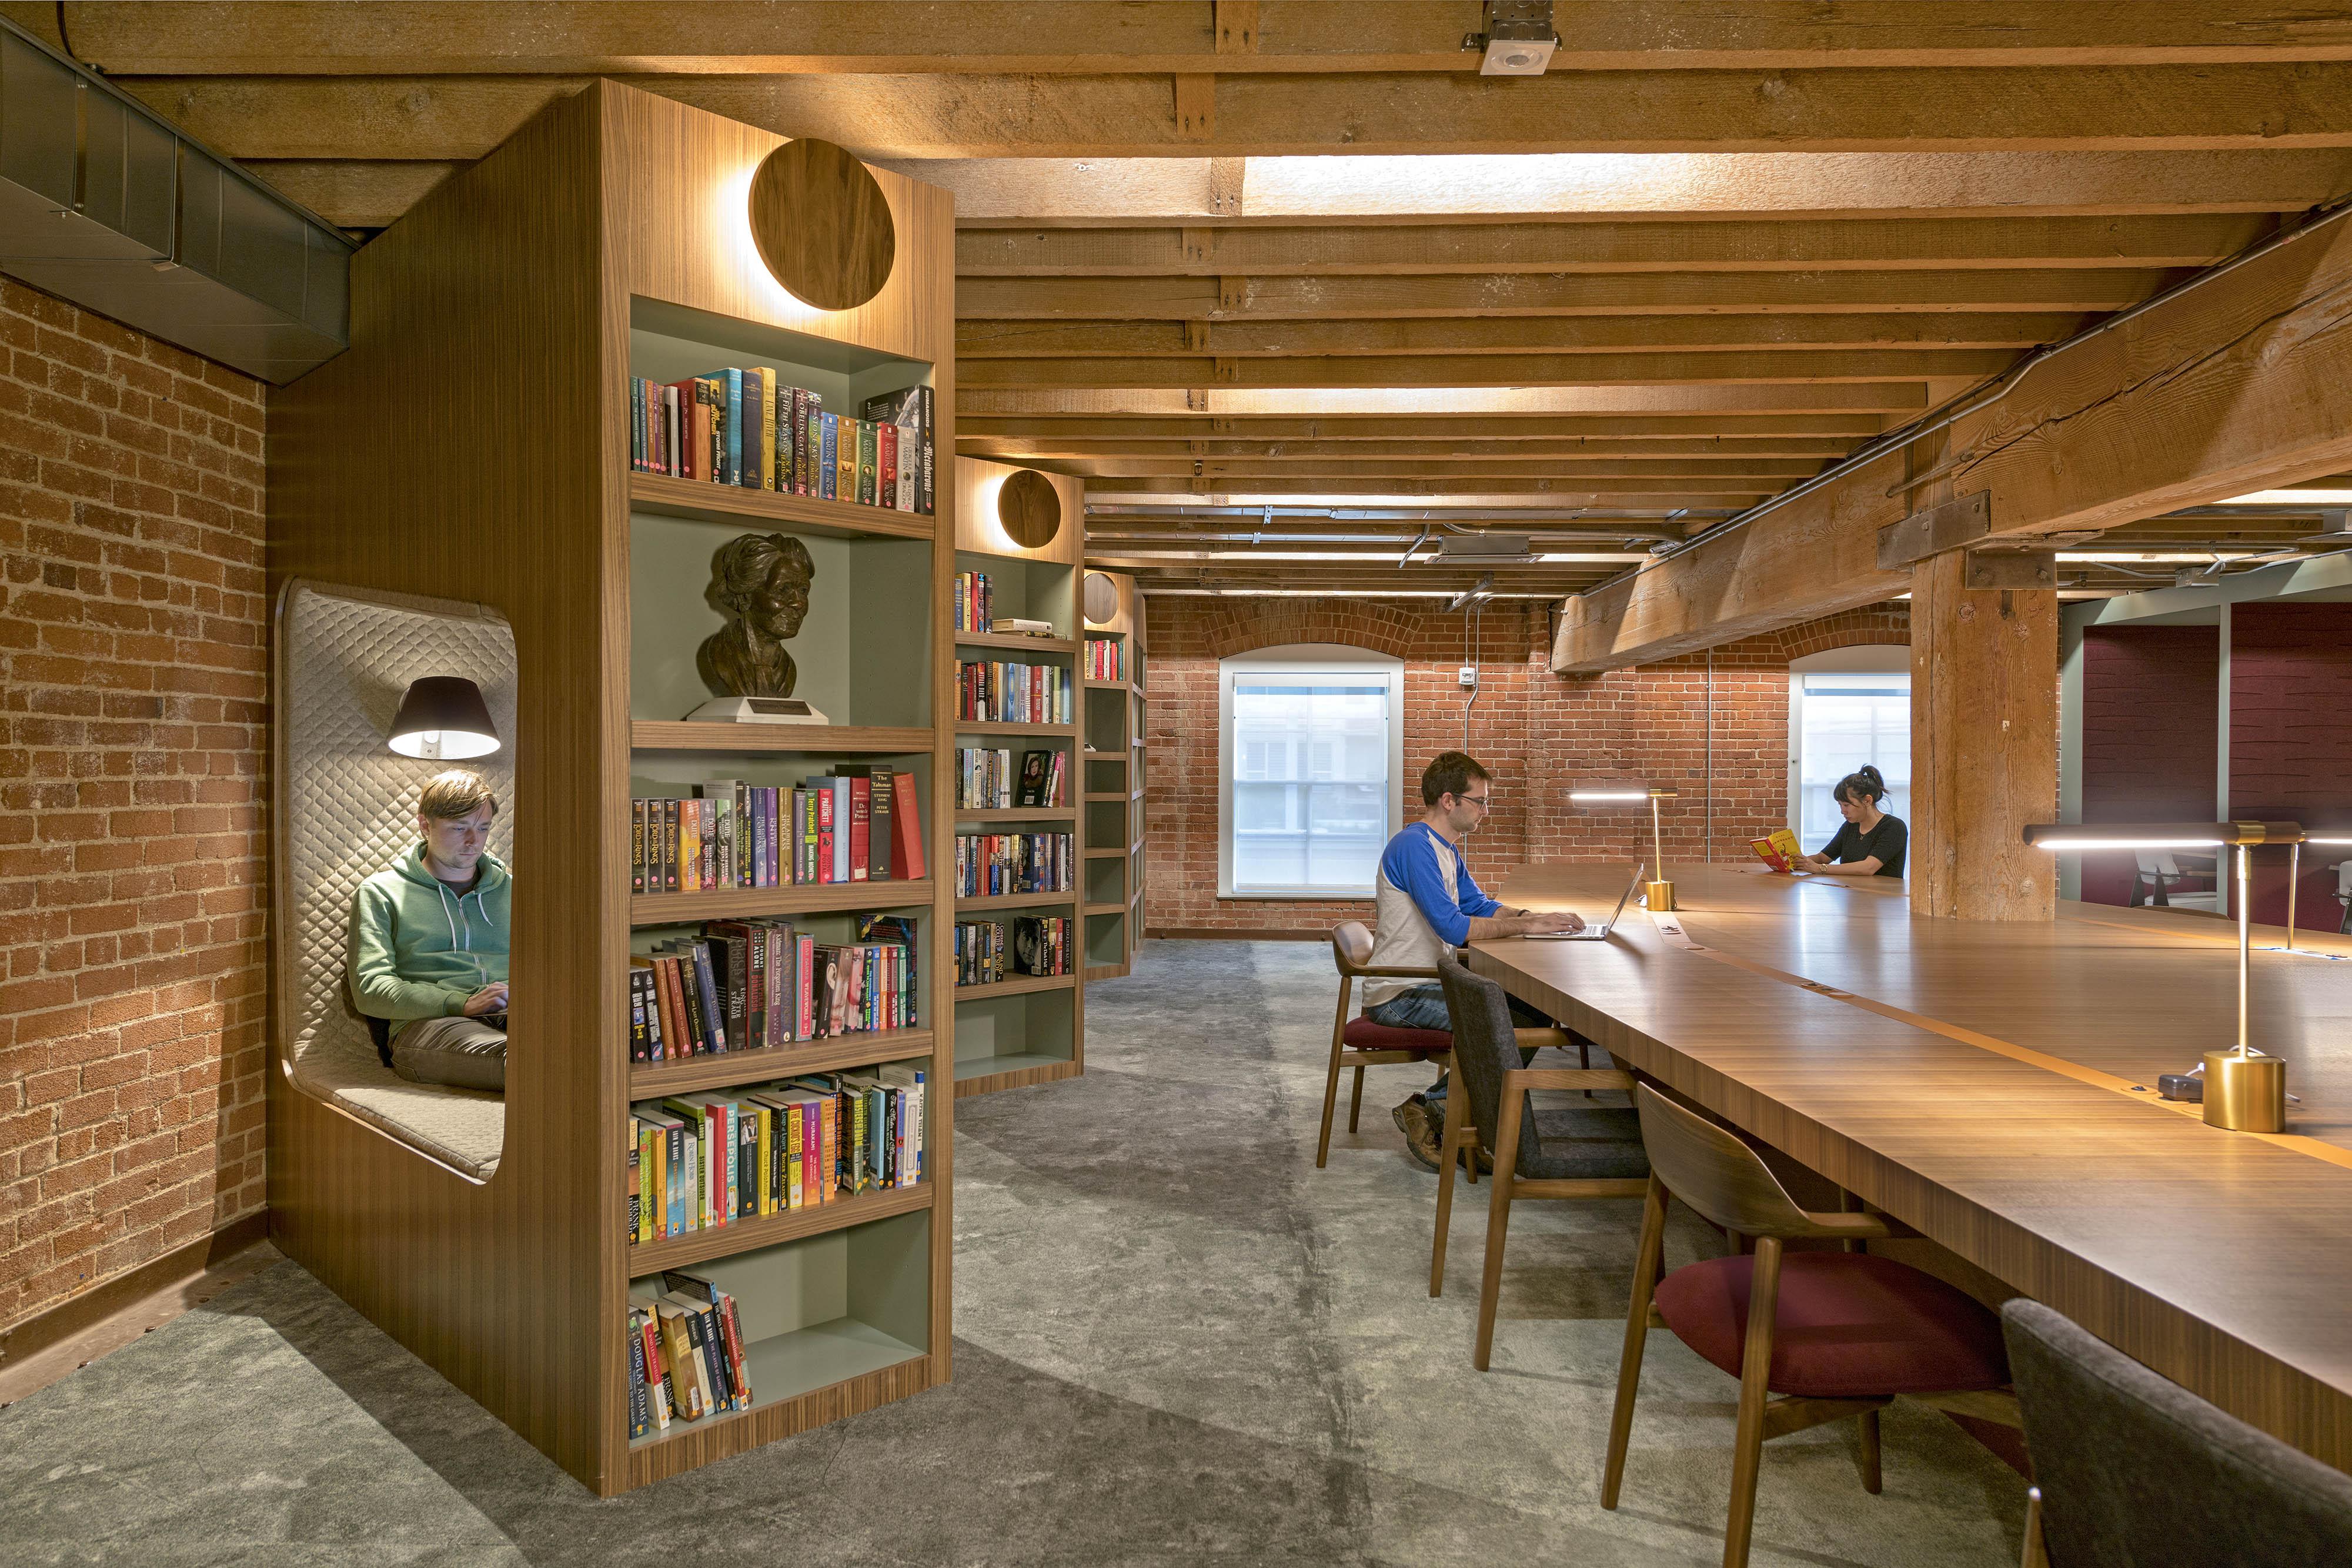 GitHub's refurbished San Francisco headquarters is designed